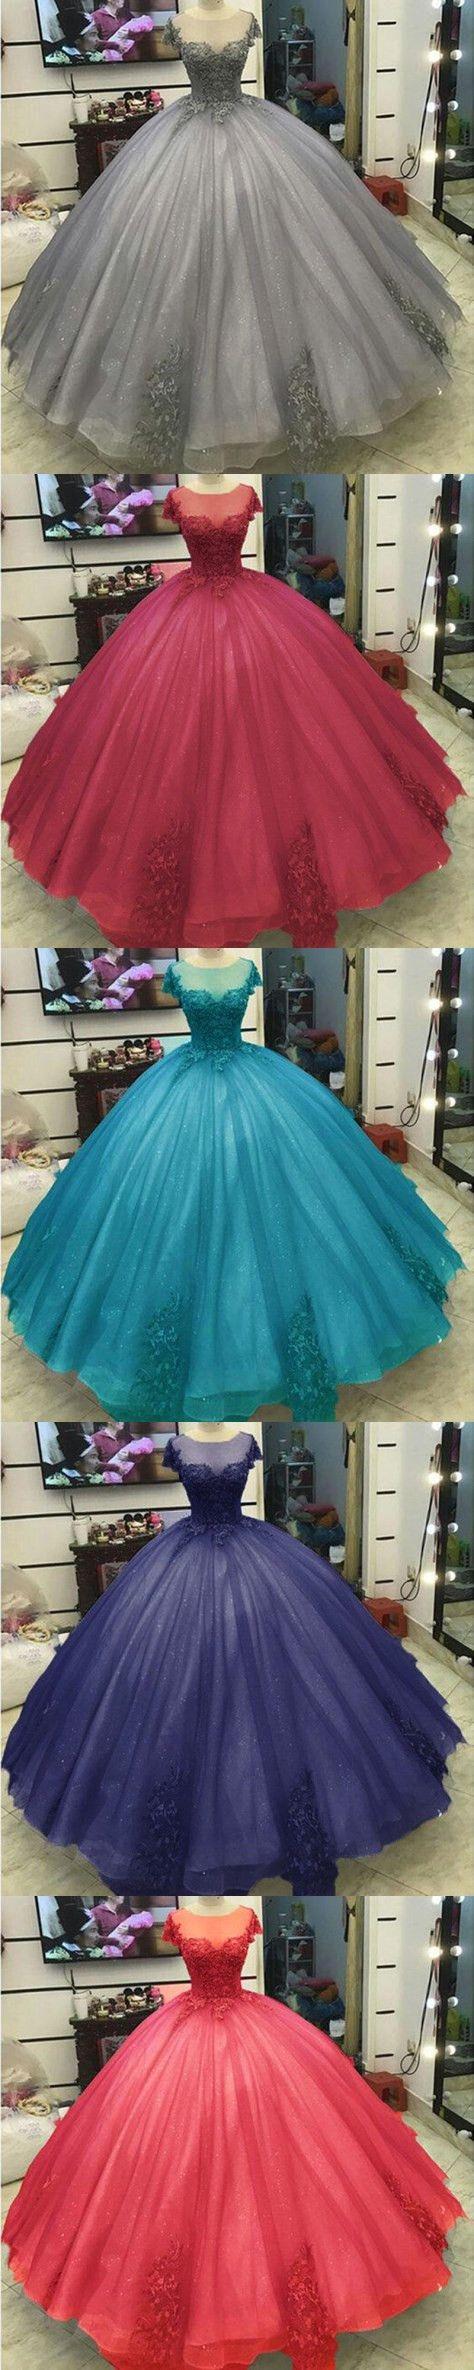 jewel tone gowns